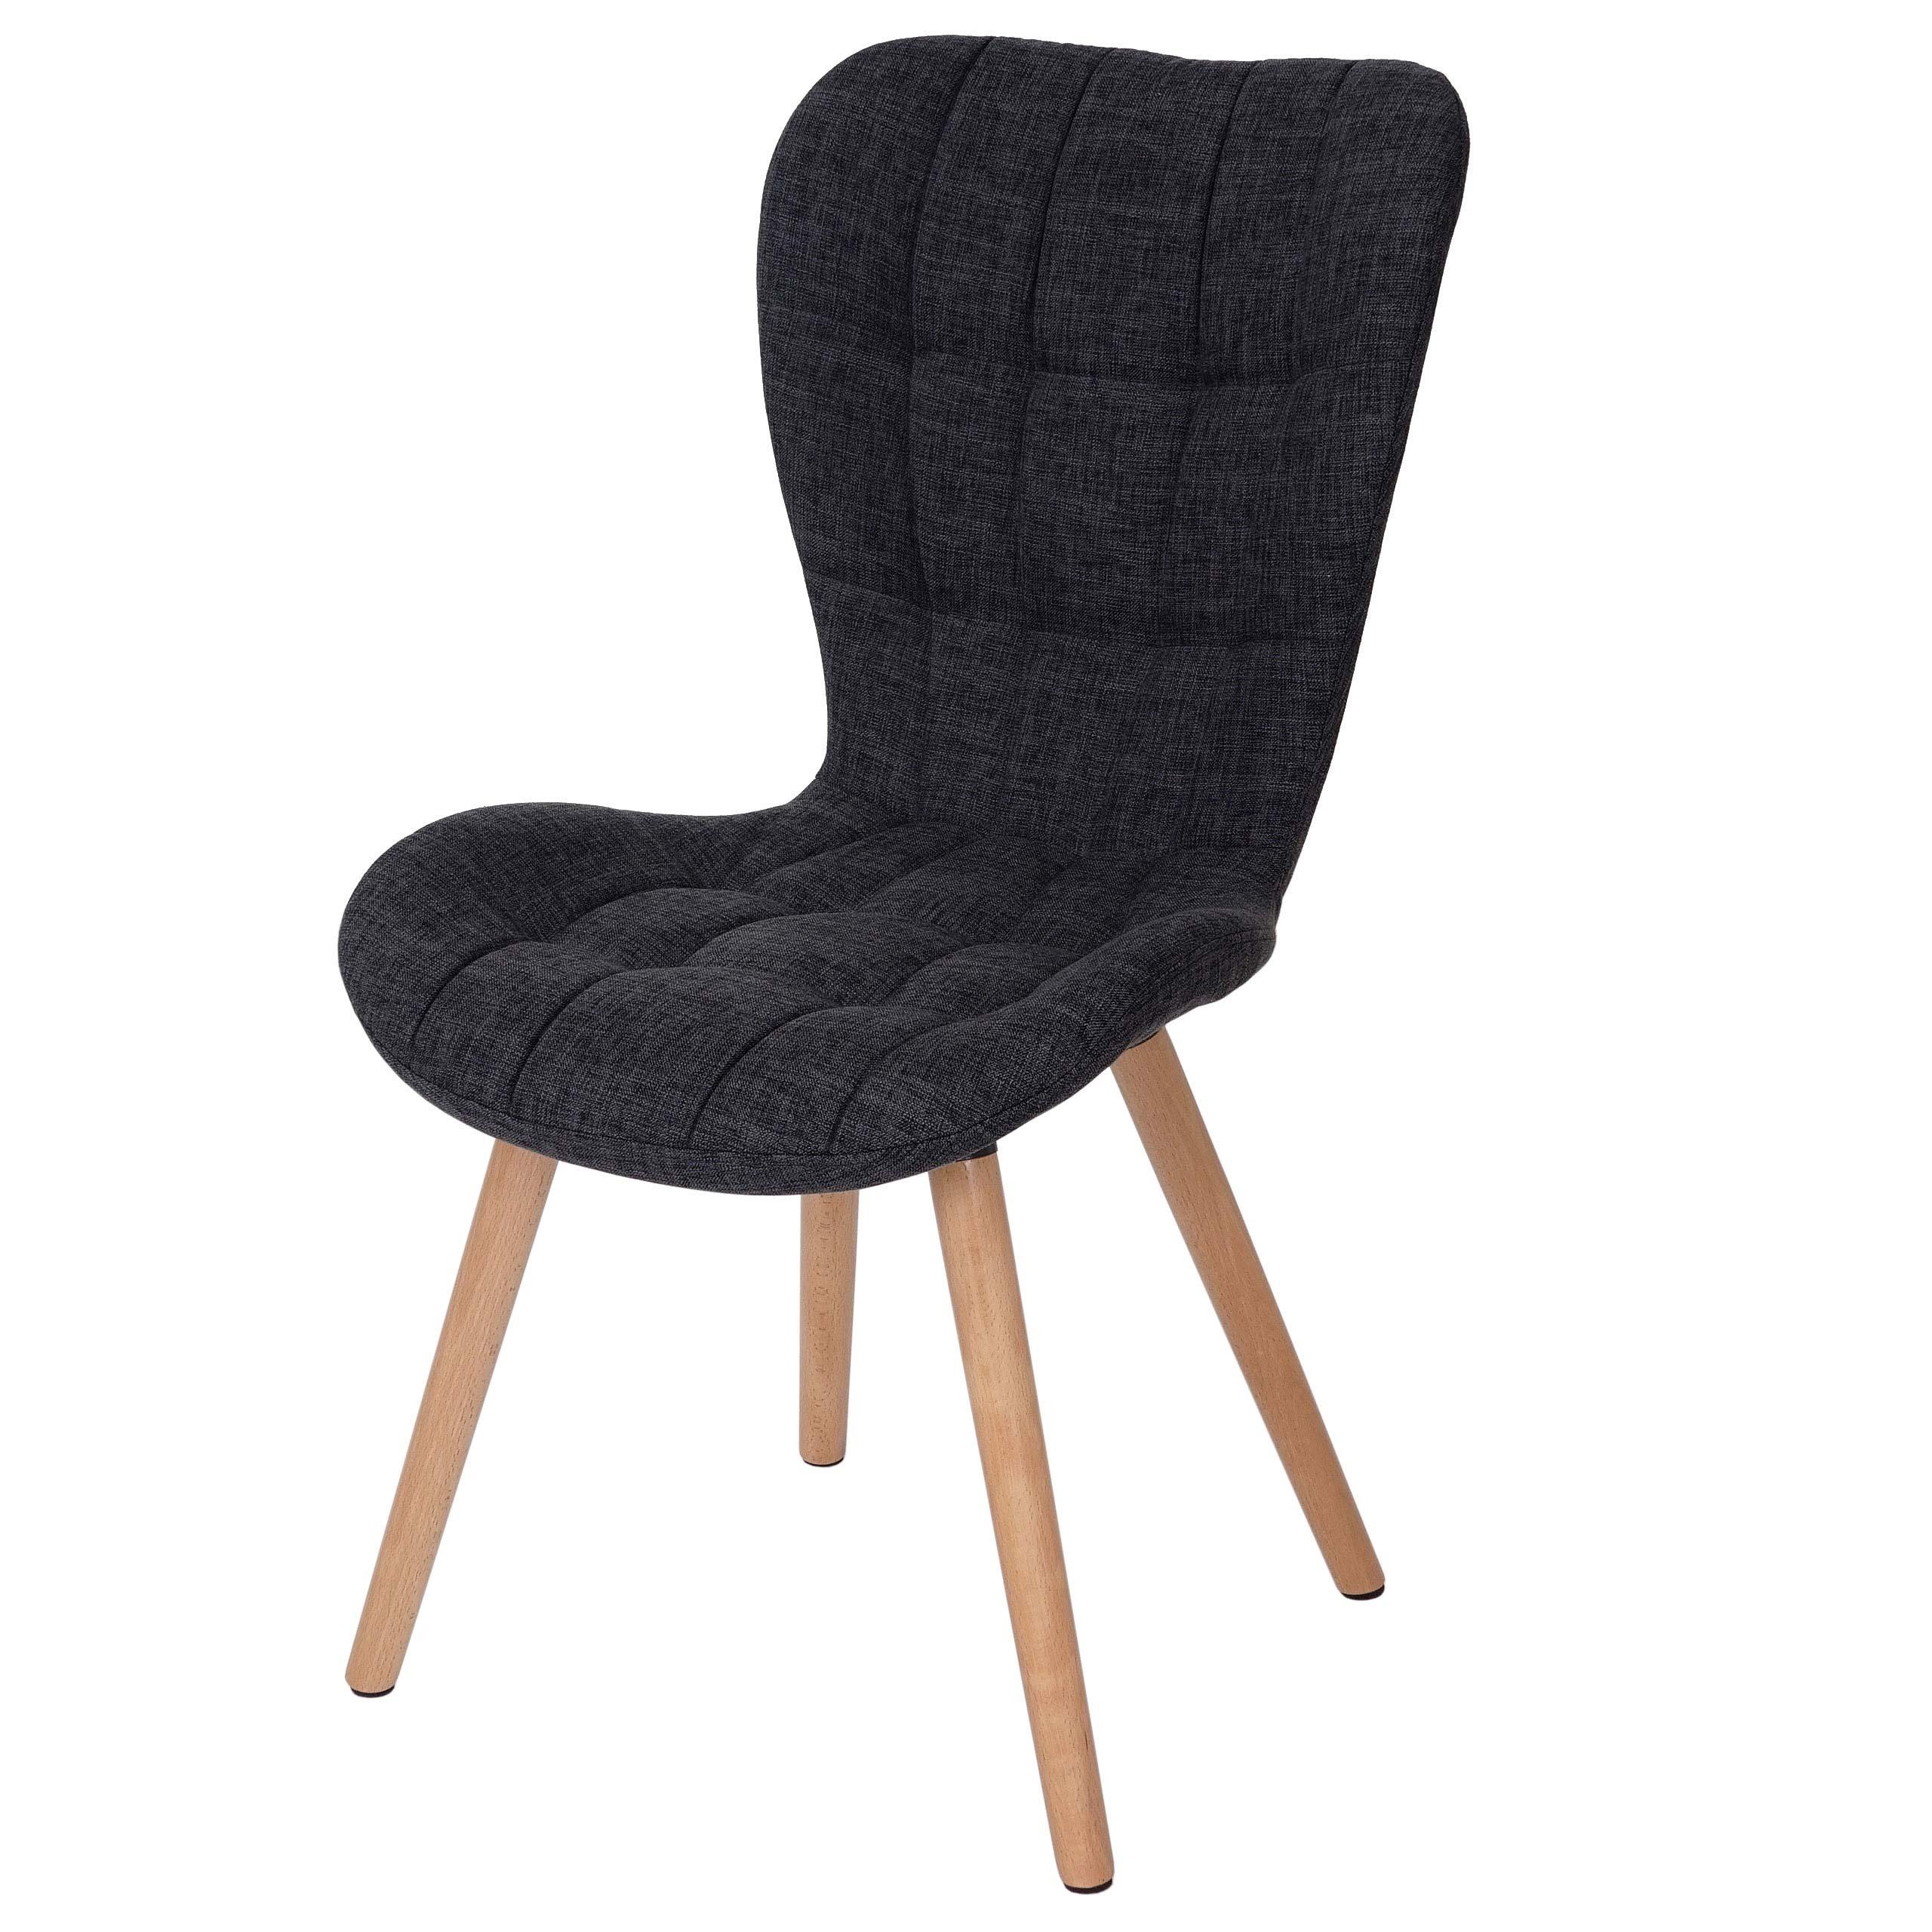 2x esszimmerstuhl hwc a87 stuhl lehnstuhl retro 50er for Stuhl design geschichte